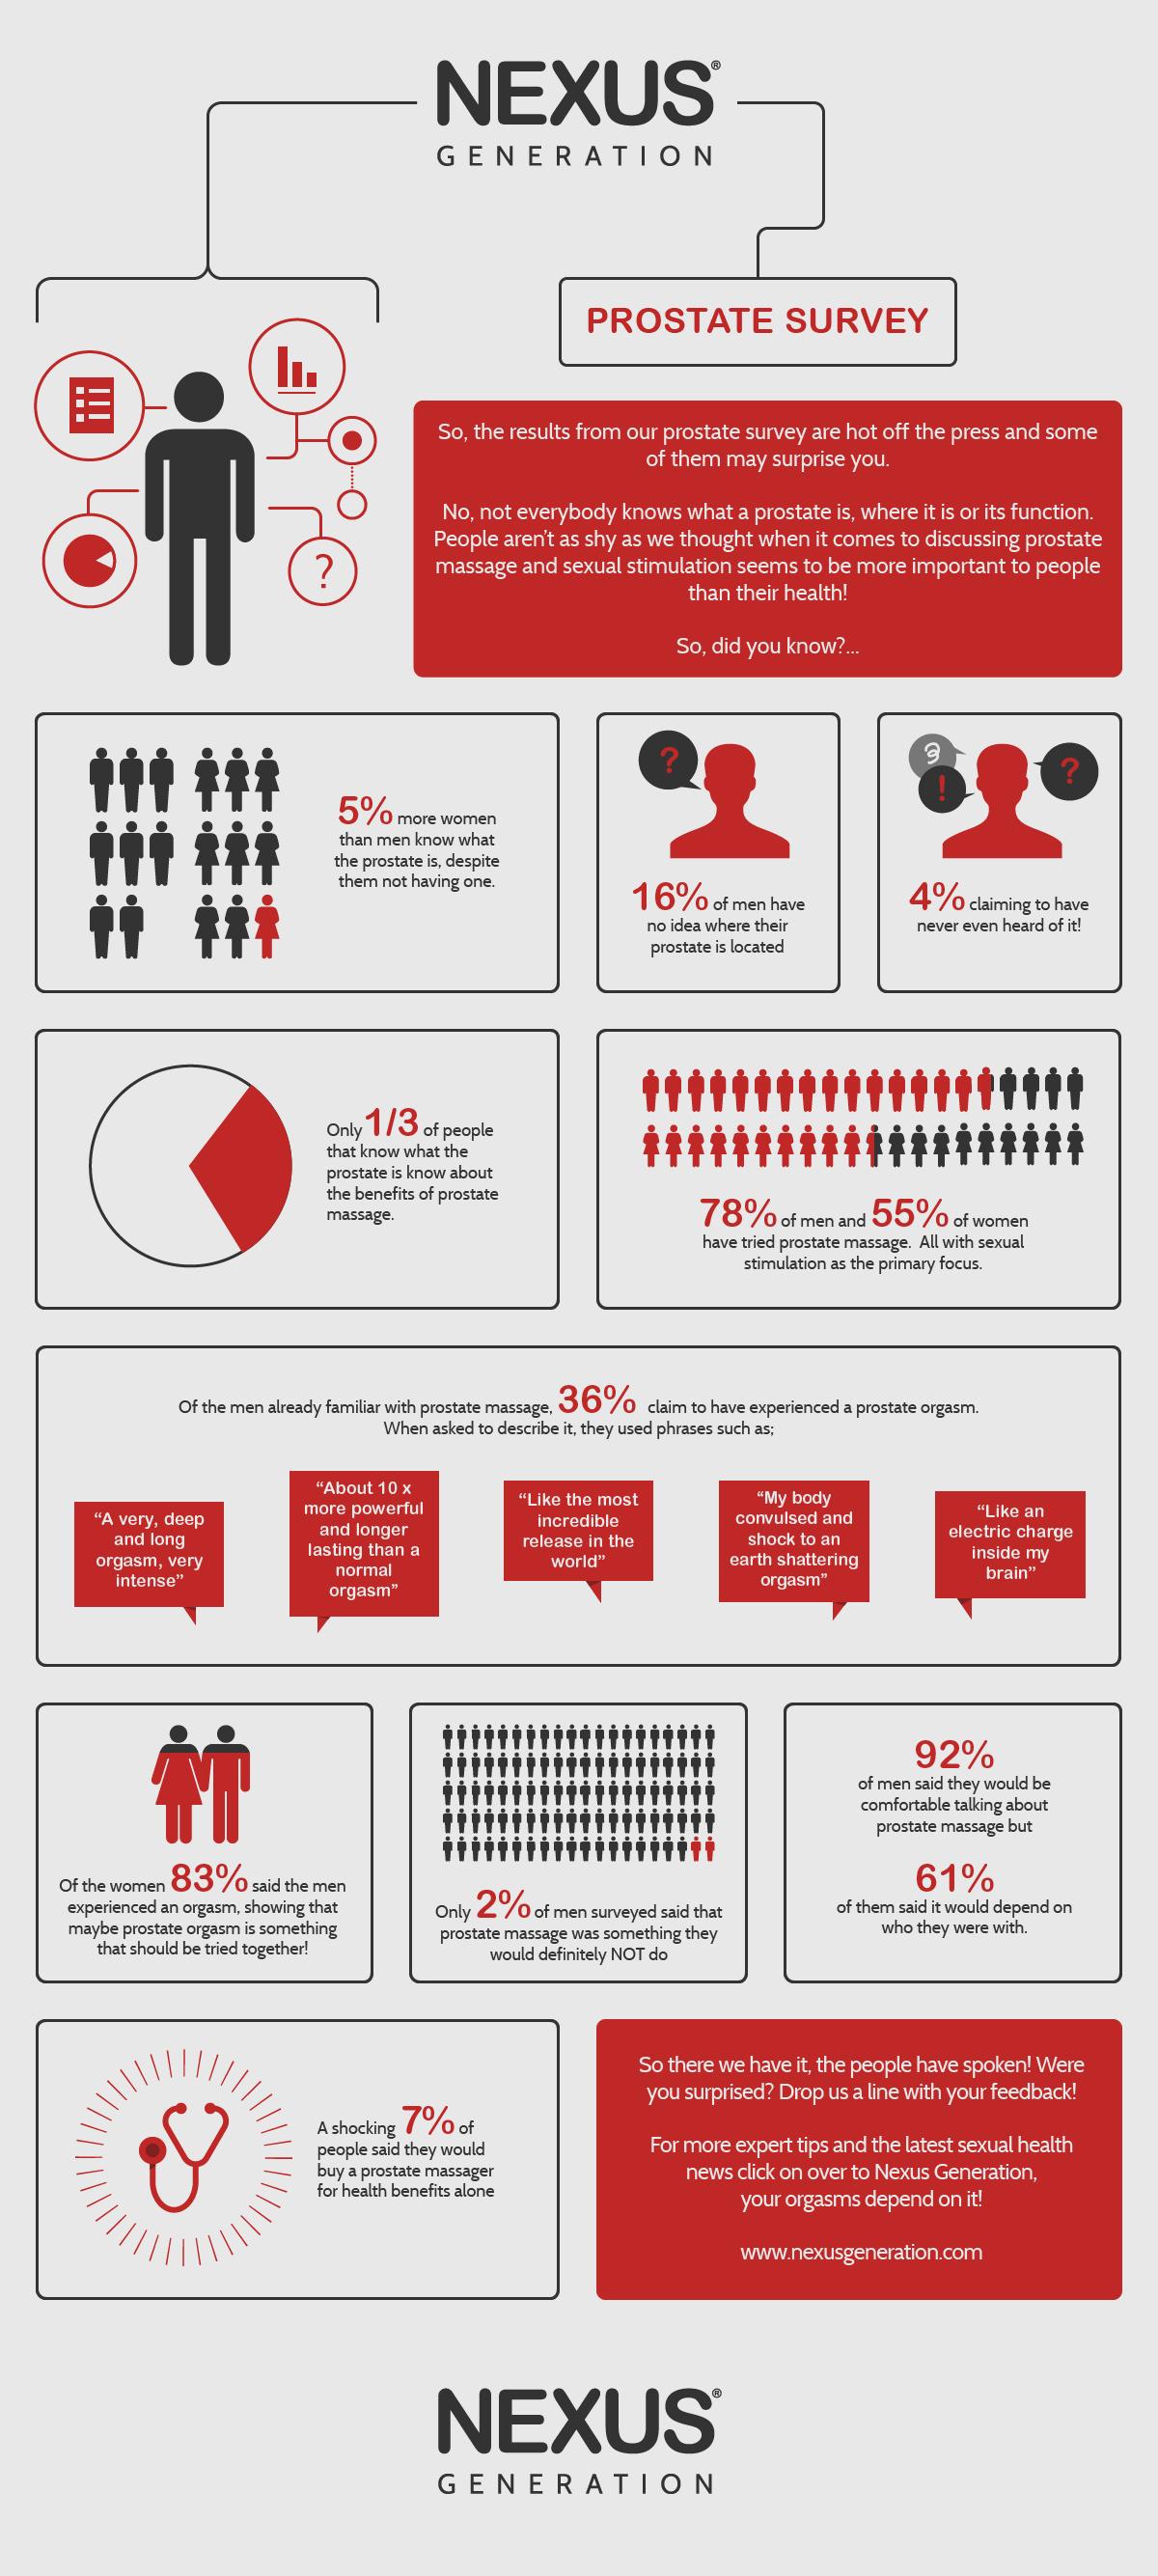 151120-1100 - Prostate Survey Results - Nexus-01